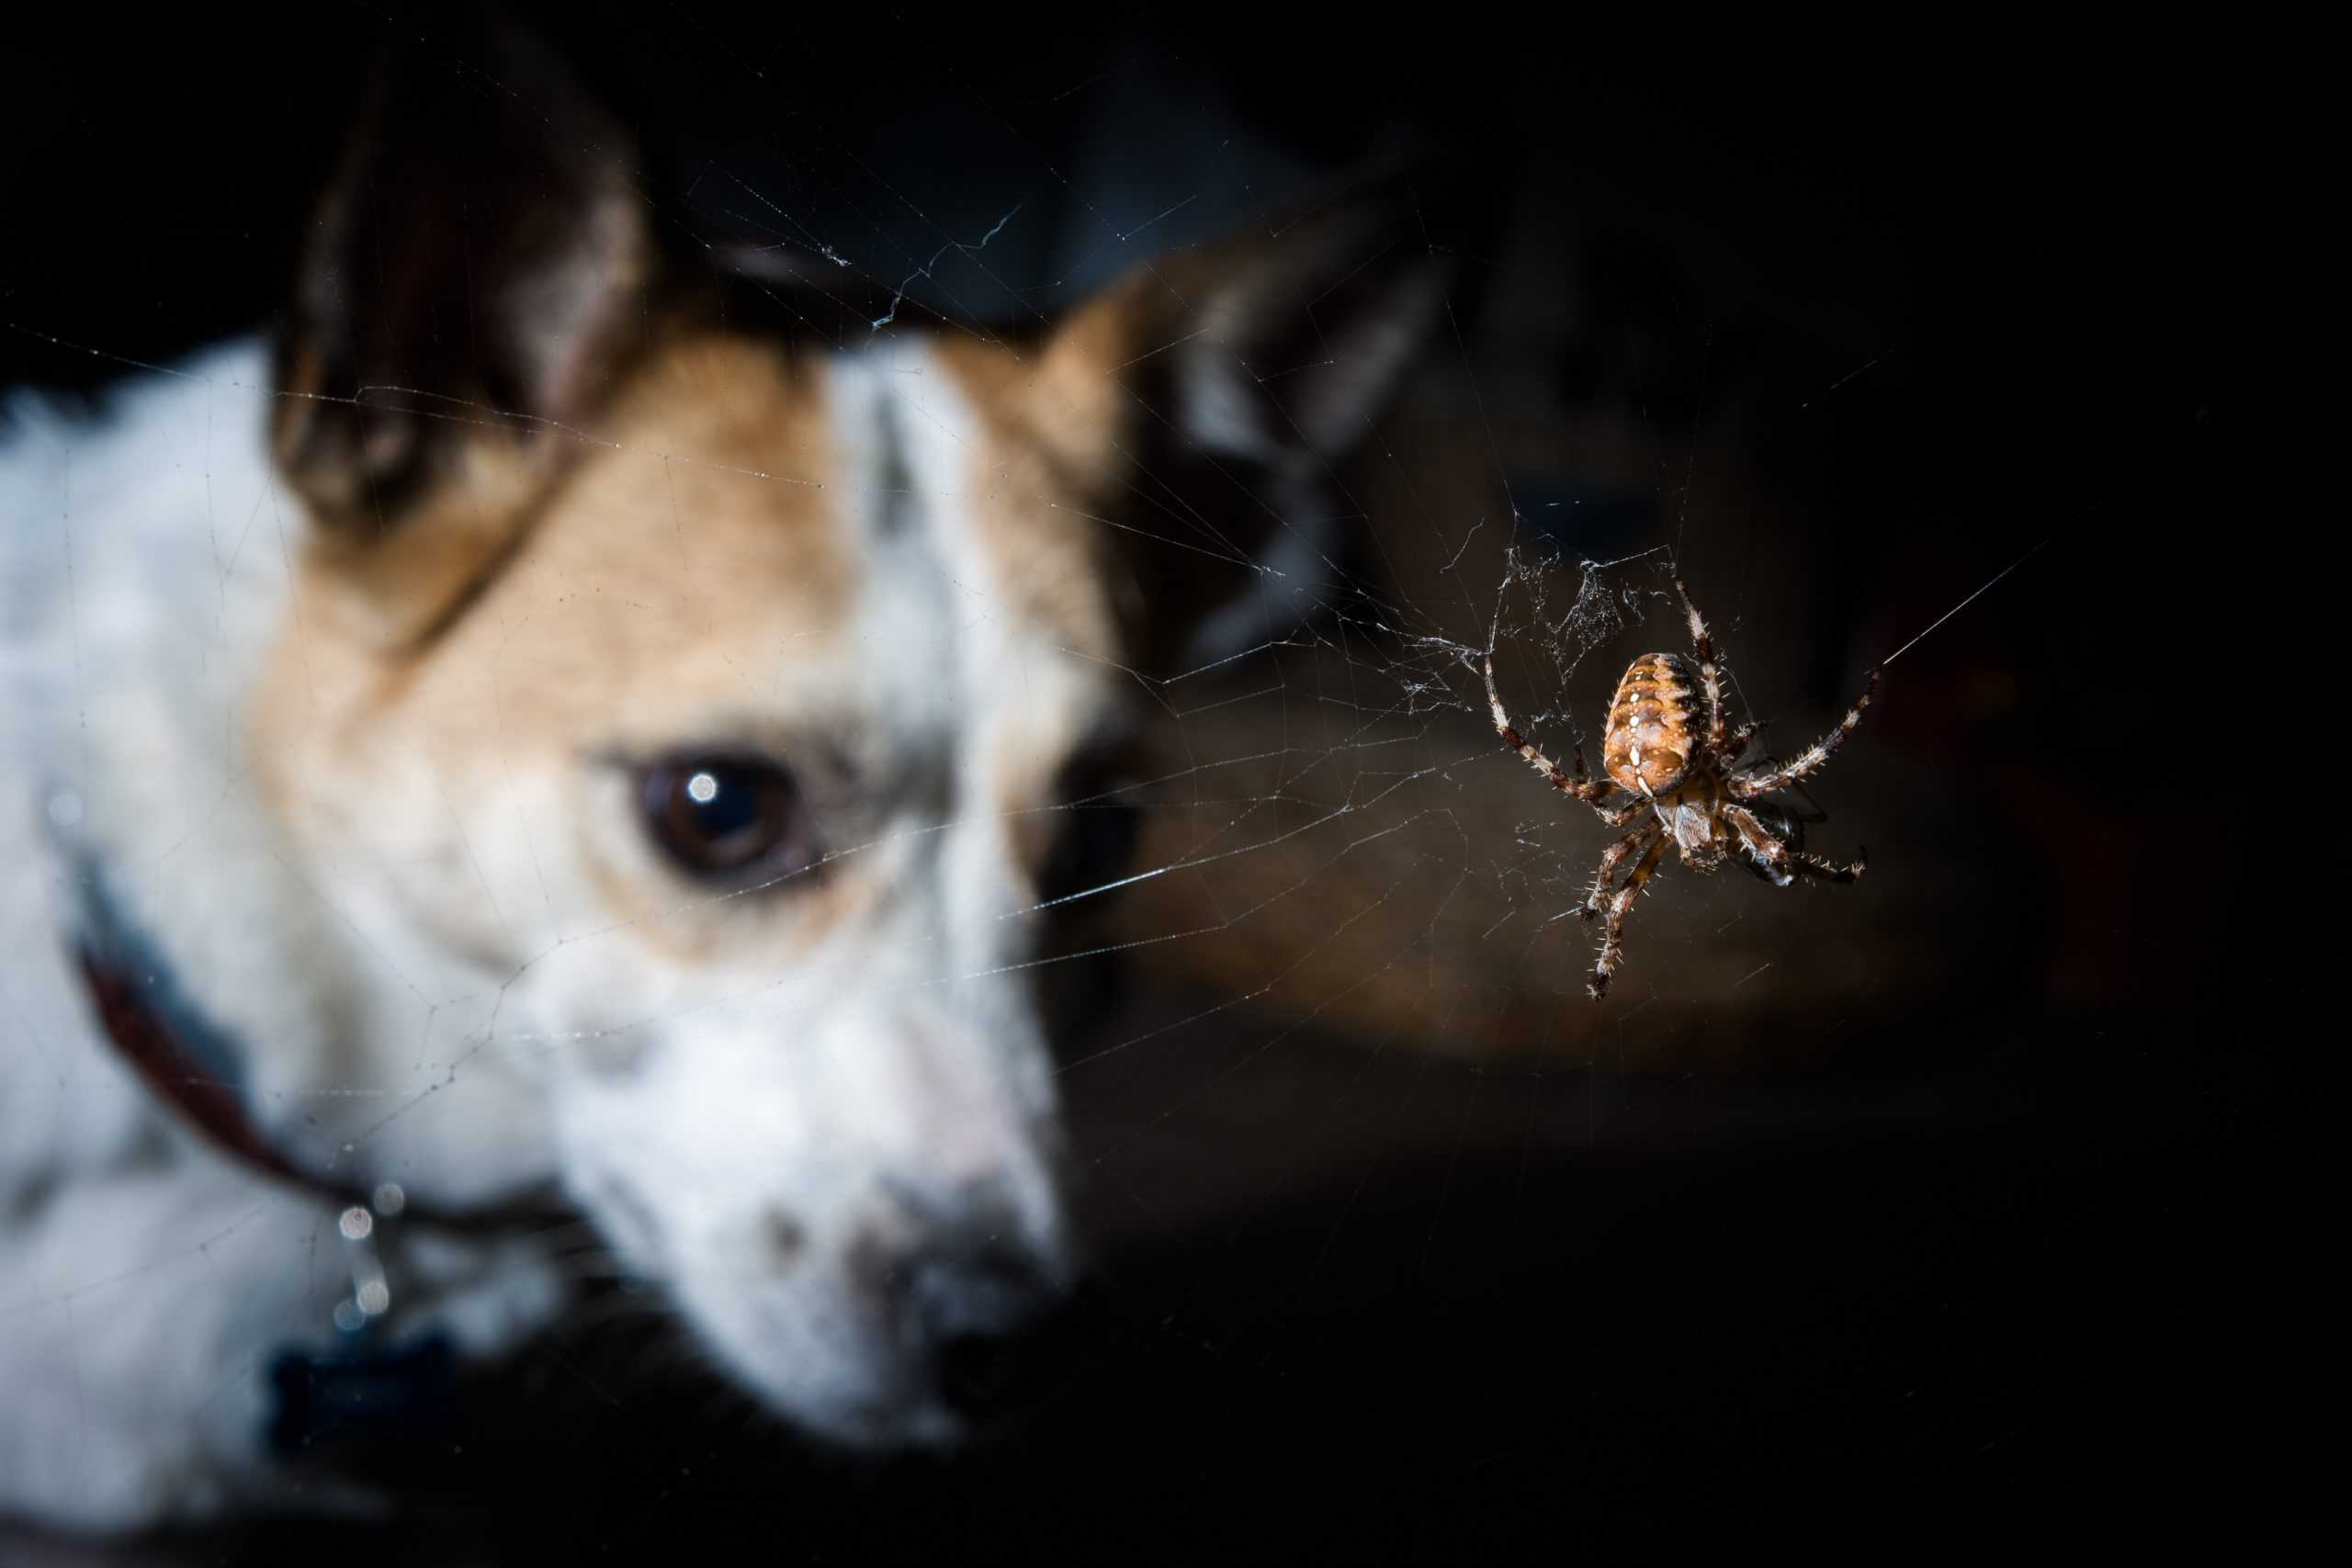 dog looking at a garden spider